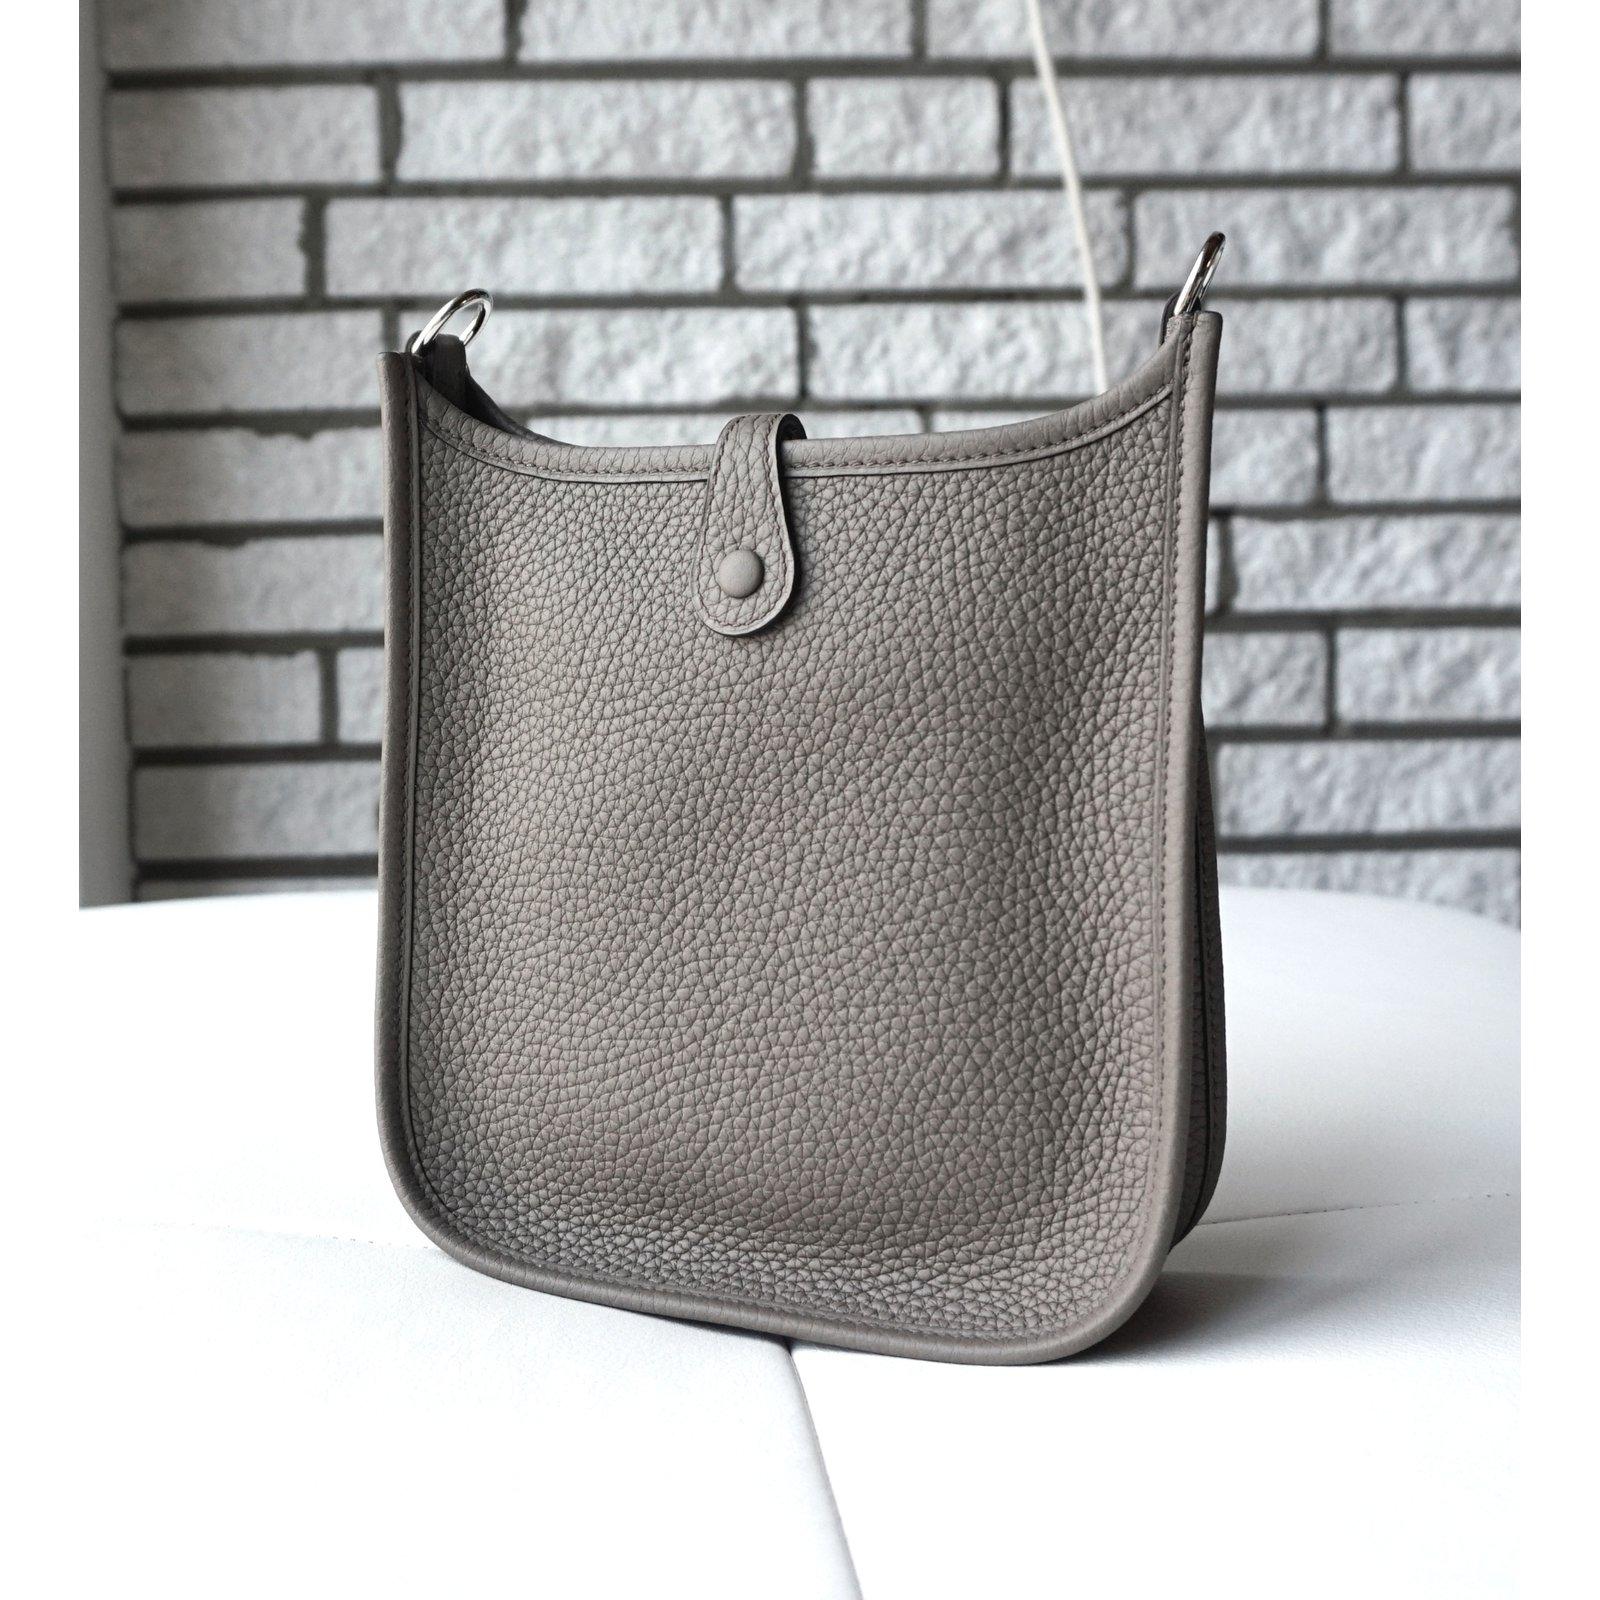 ebe79a1fac0a ... cheap hermès evelyne tpm handbags leather grey ref.22217 joli closet  ce42e 29a94